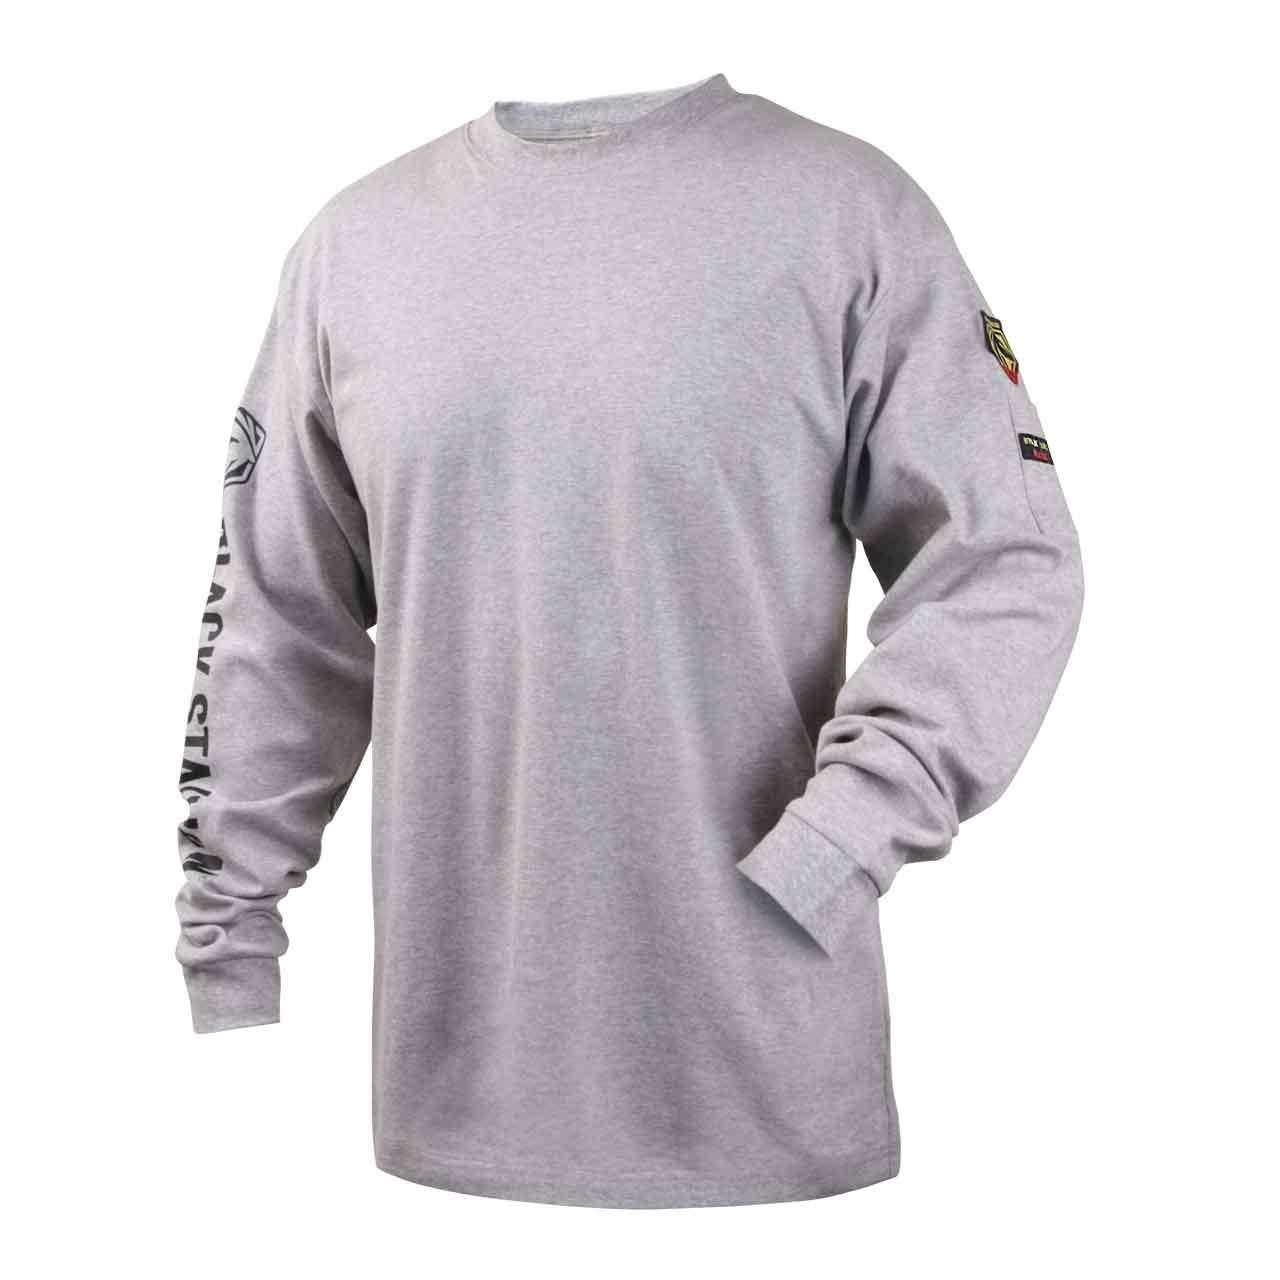 Black Stallion TF2510-GY NFPA 2112 & NFPA70E FR Cotton Knit Long-Sleev